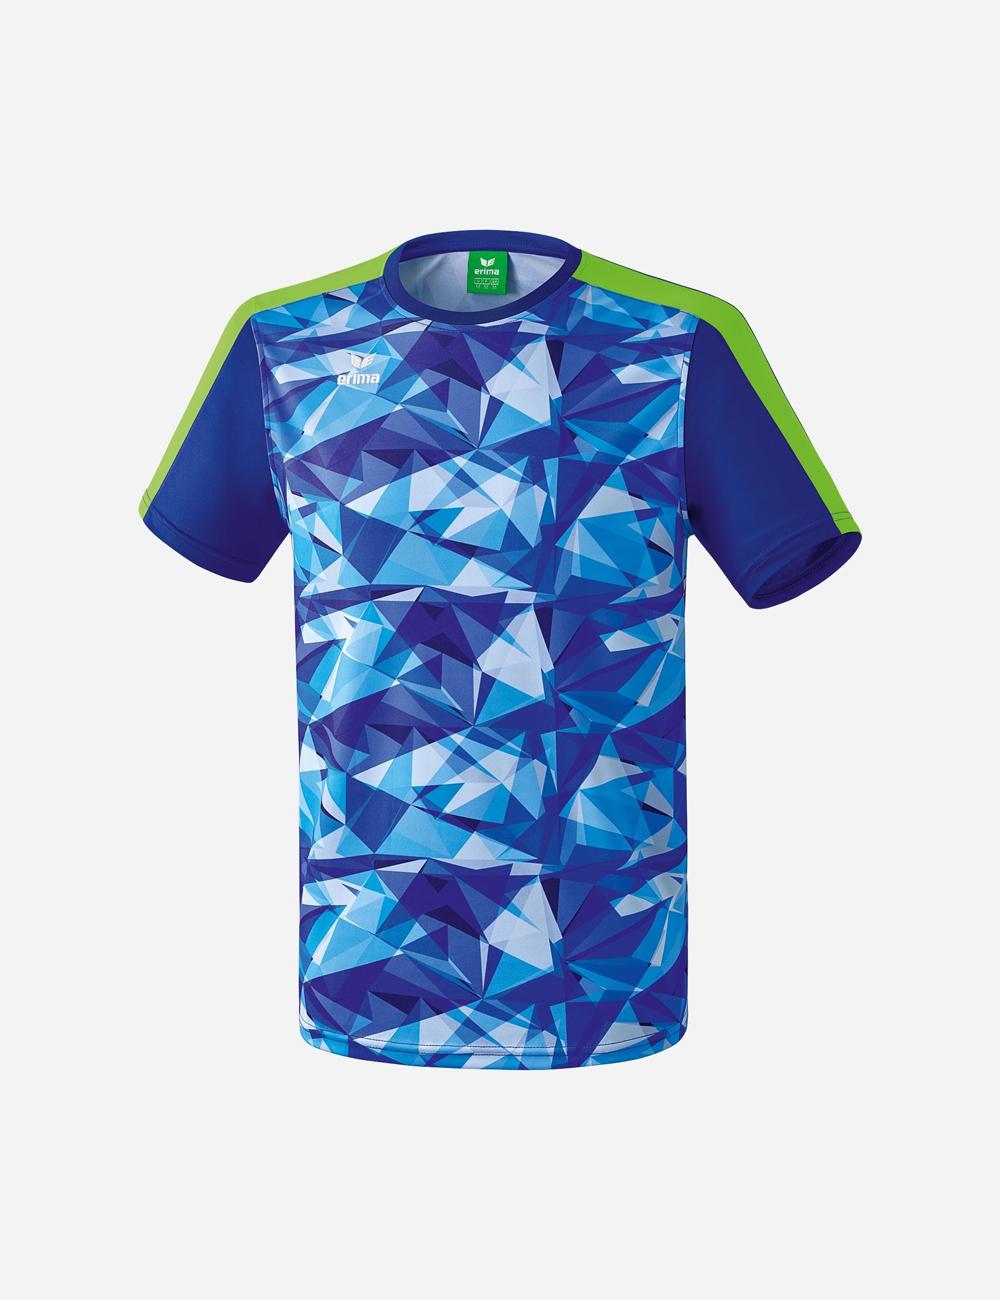 Herren T-Shirt Masters T-Shirt, mazarine blue/green gecko, L